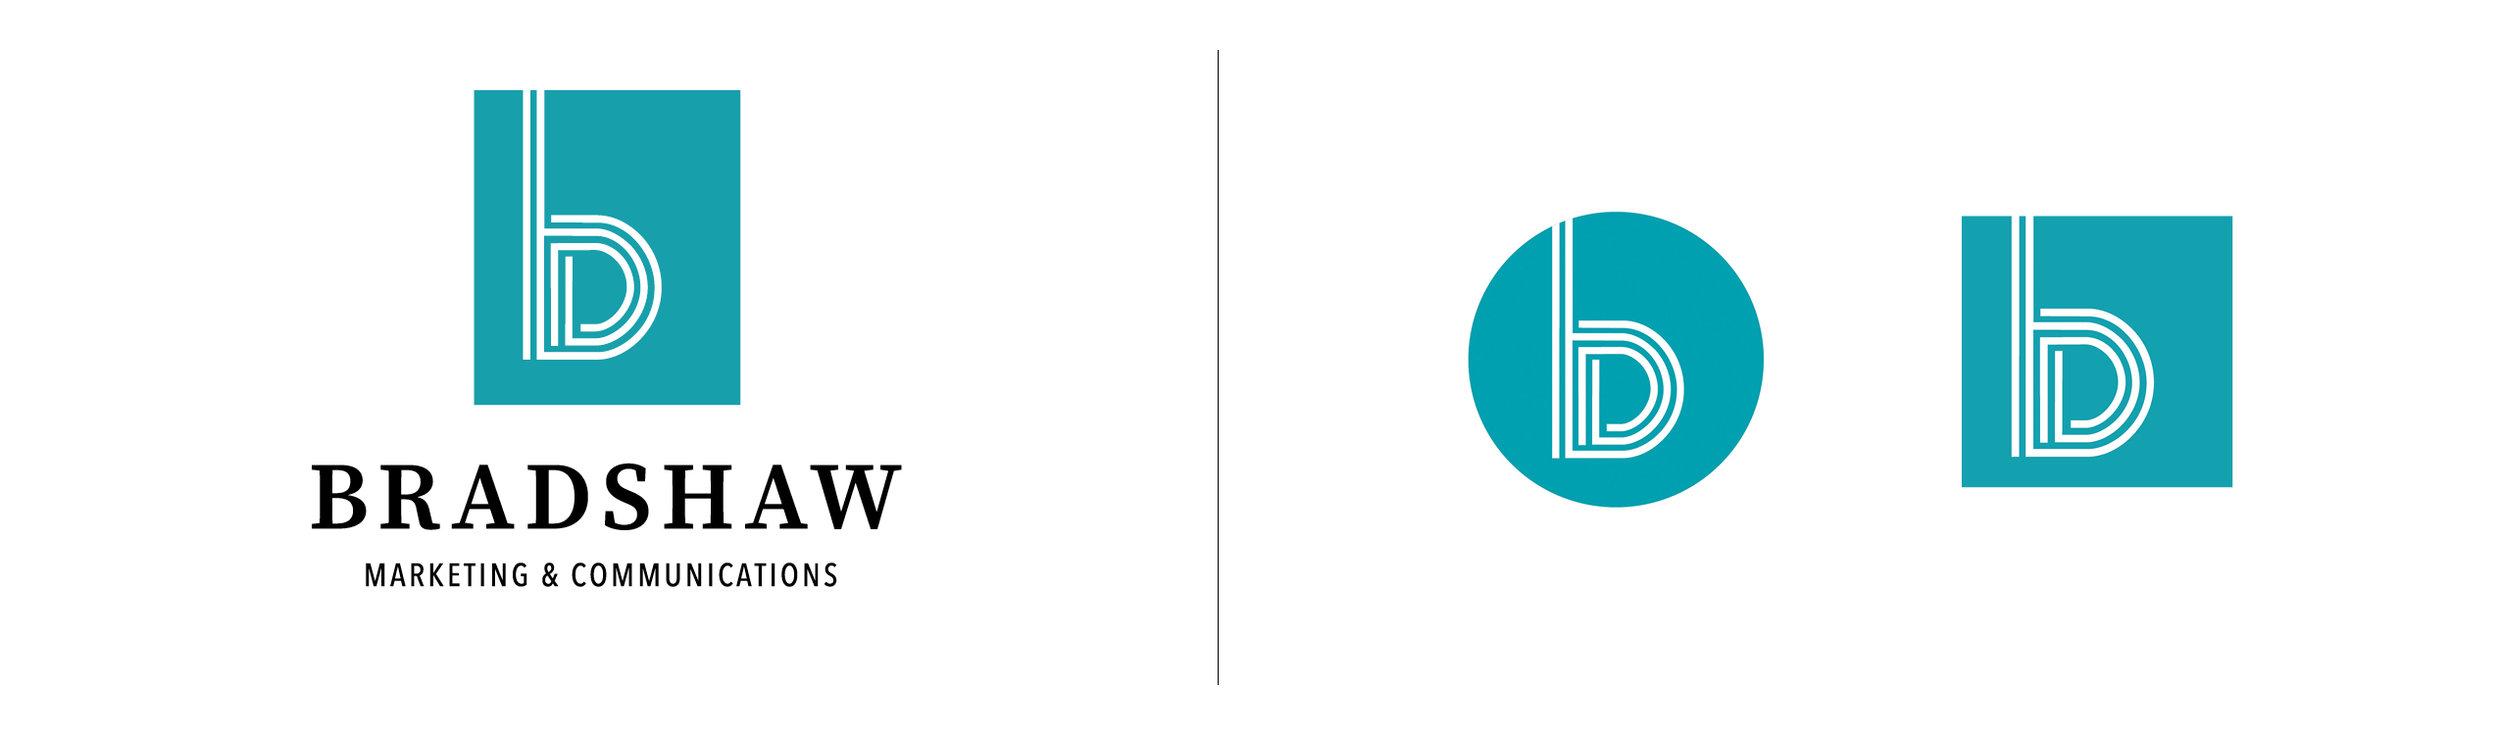 bradshaw_logo.jpg